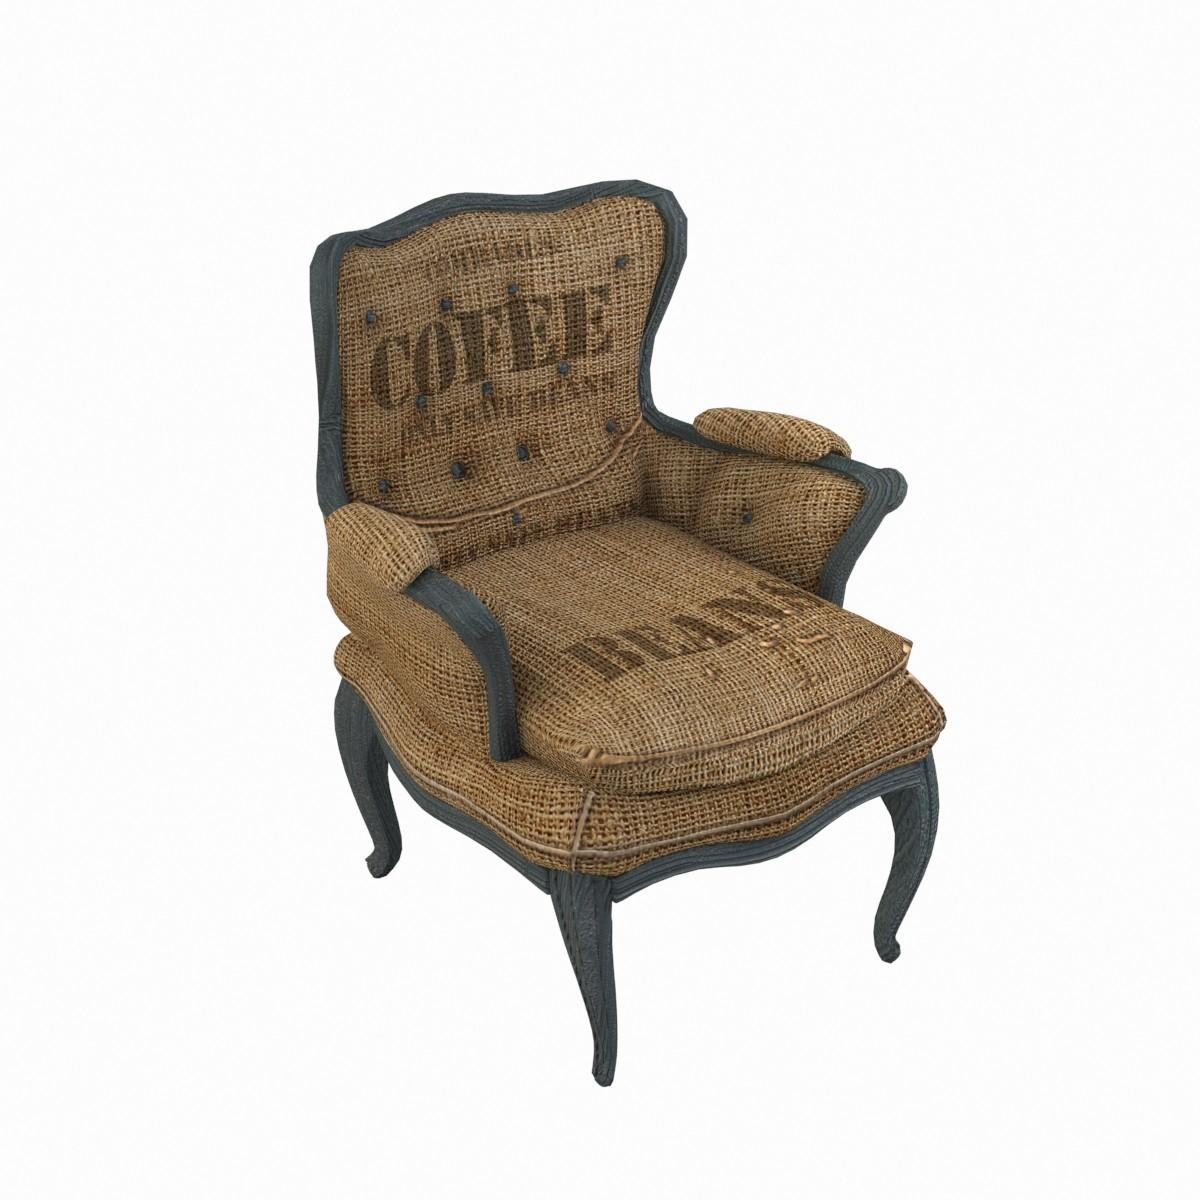 burlap_chair_00.jpg